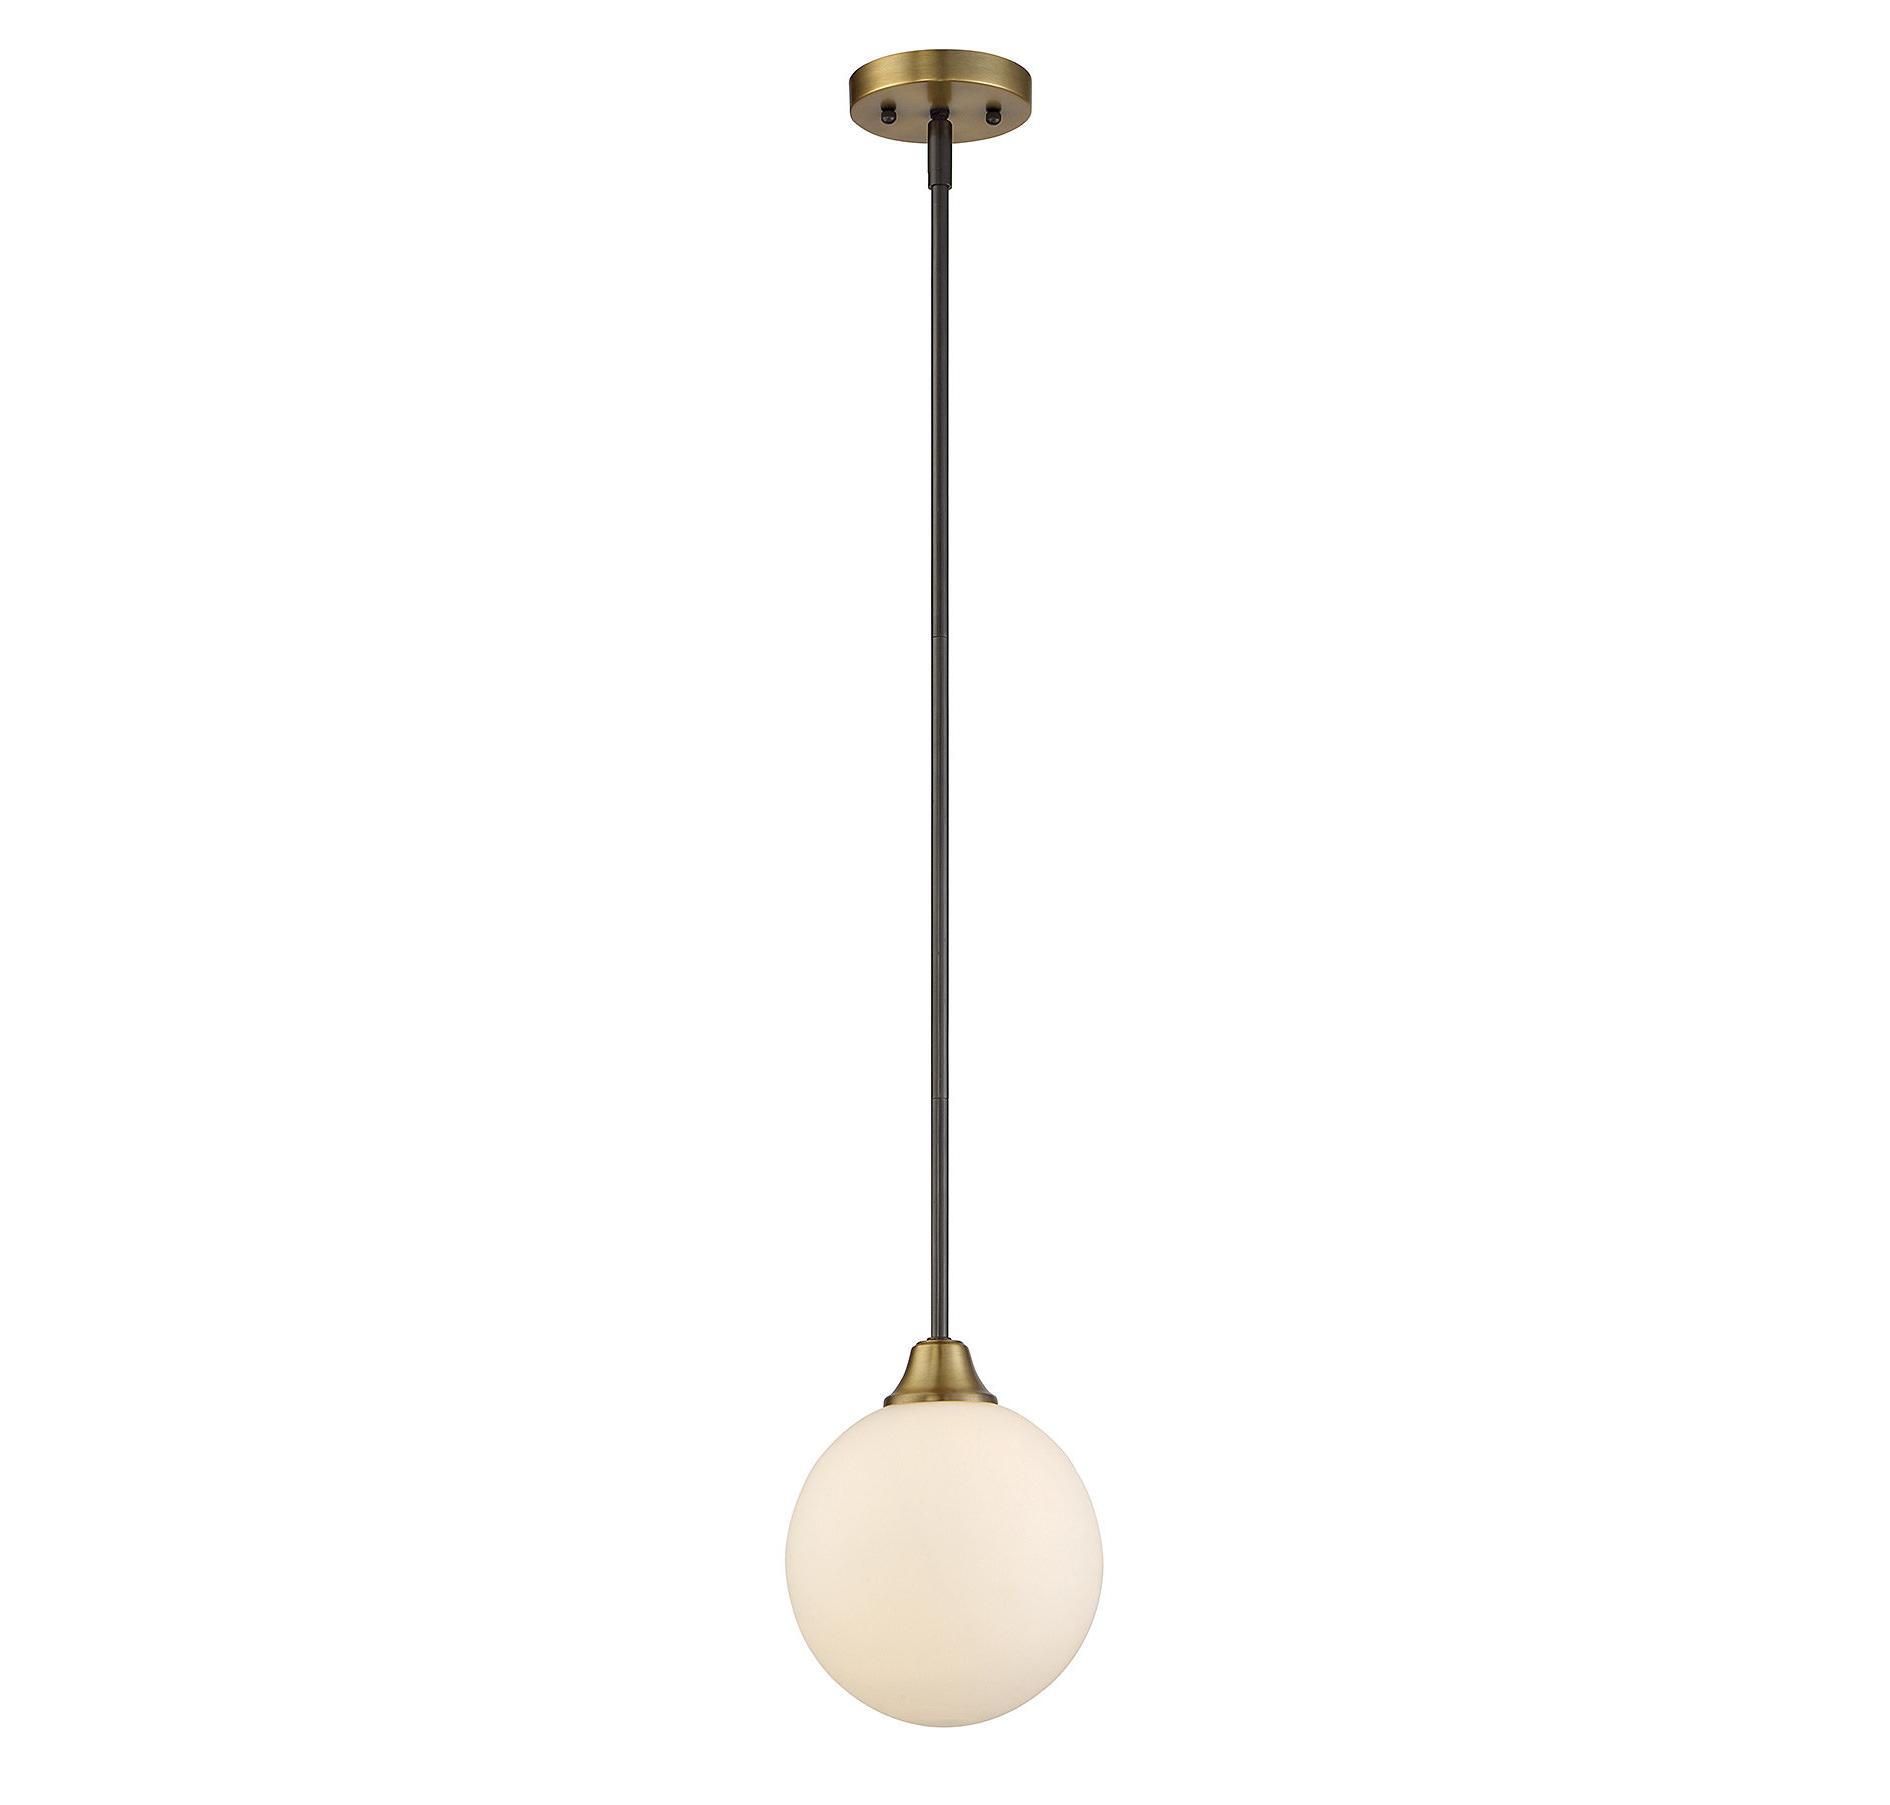 Fashionable Bautista 1 Light Single Globe Pendant Intended For Bautista 6 Light Kitchen Island Bulb Pendants (View 9 of 20)